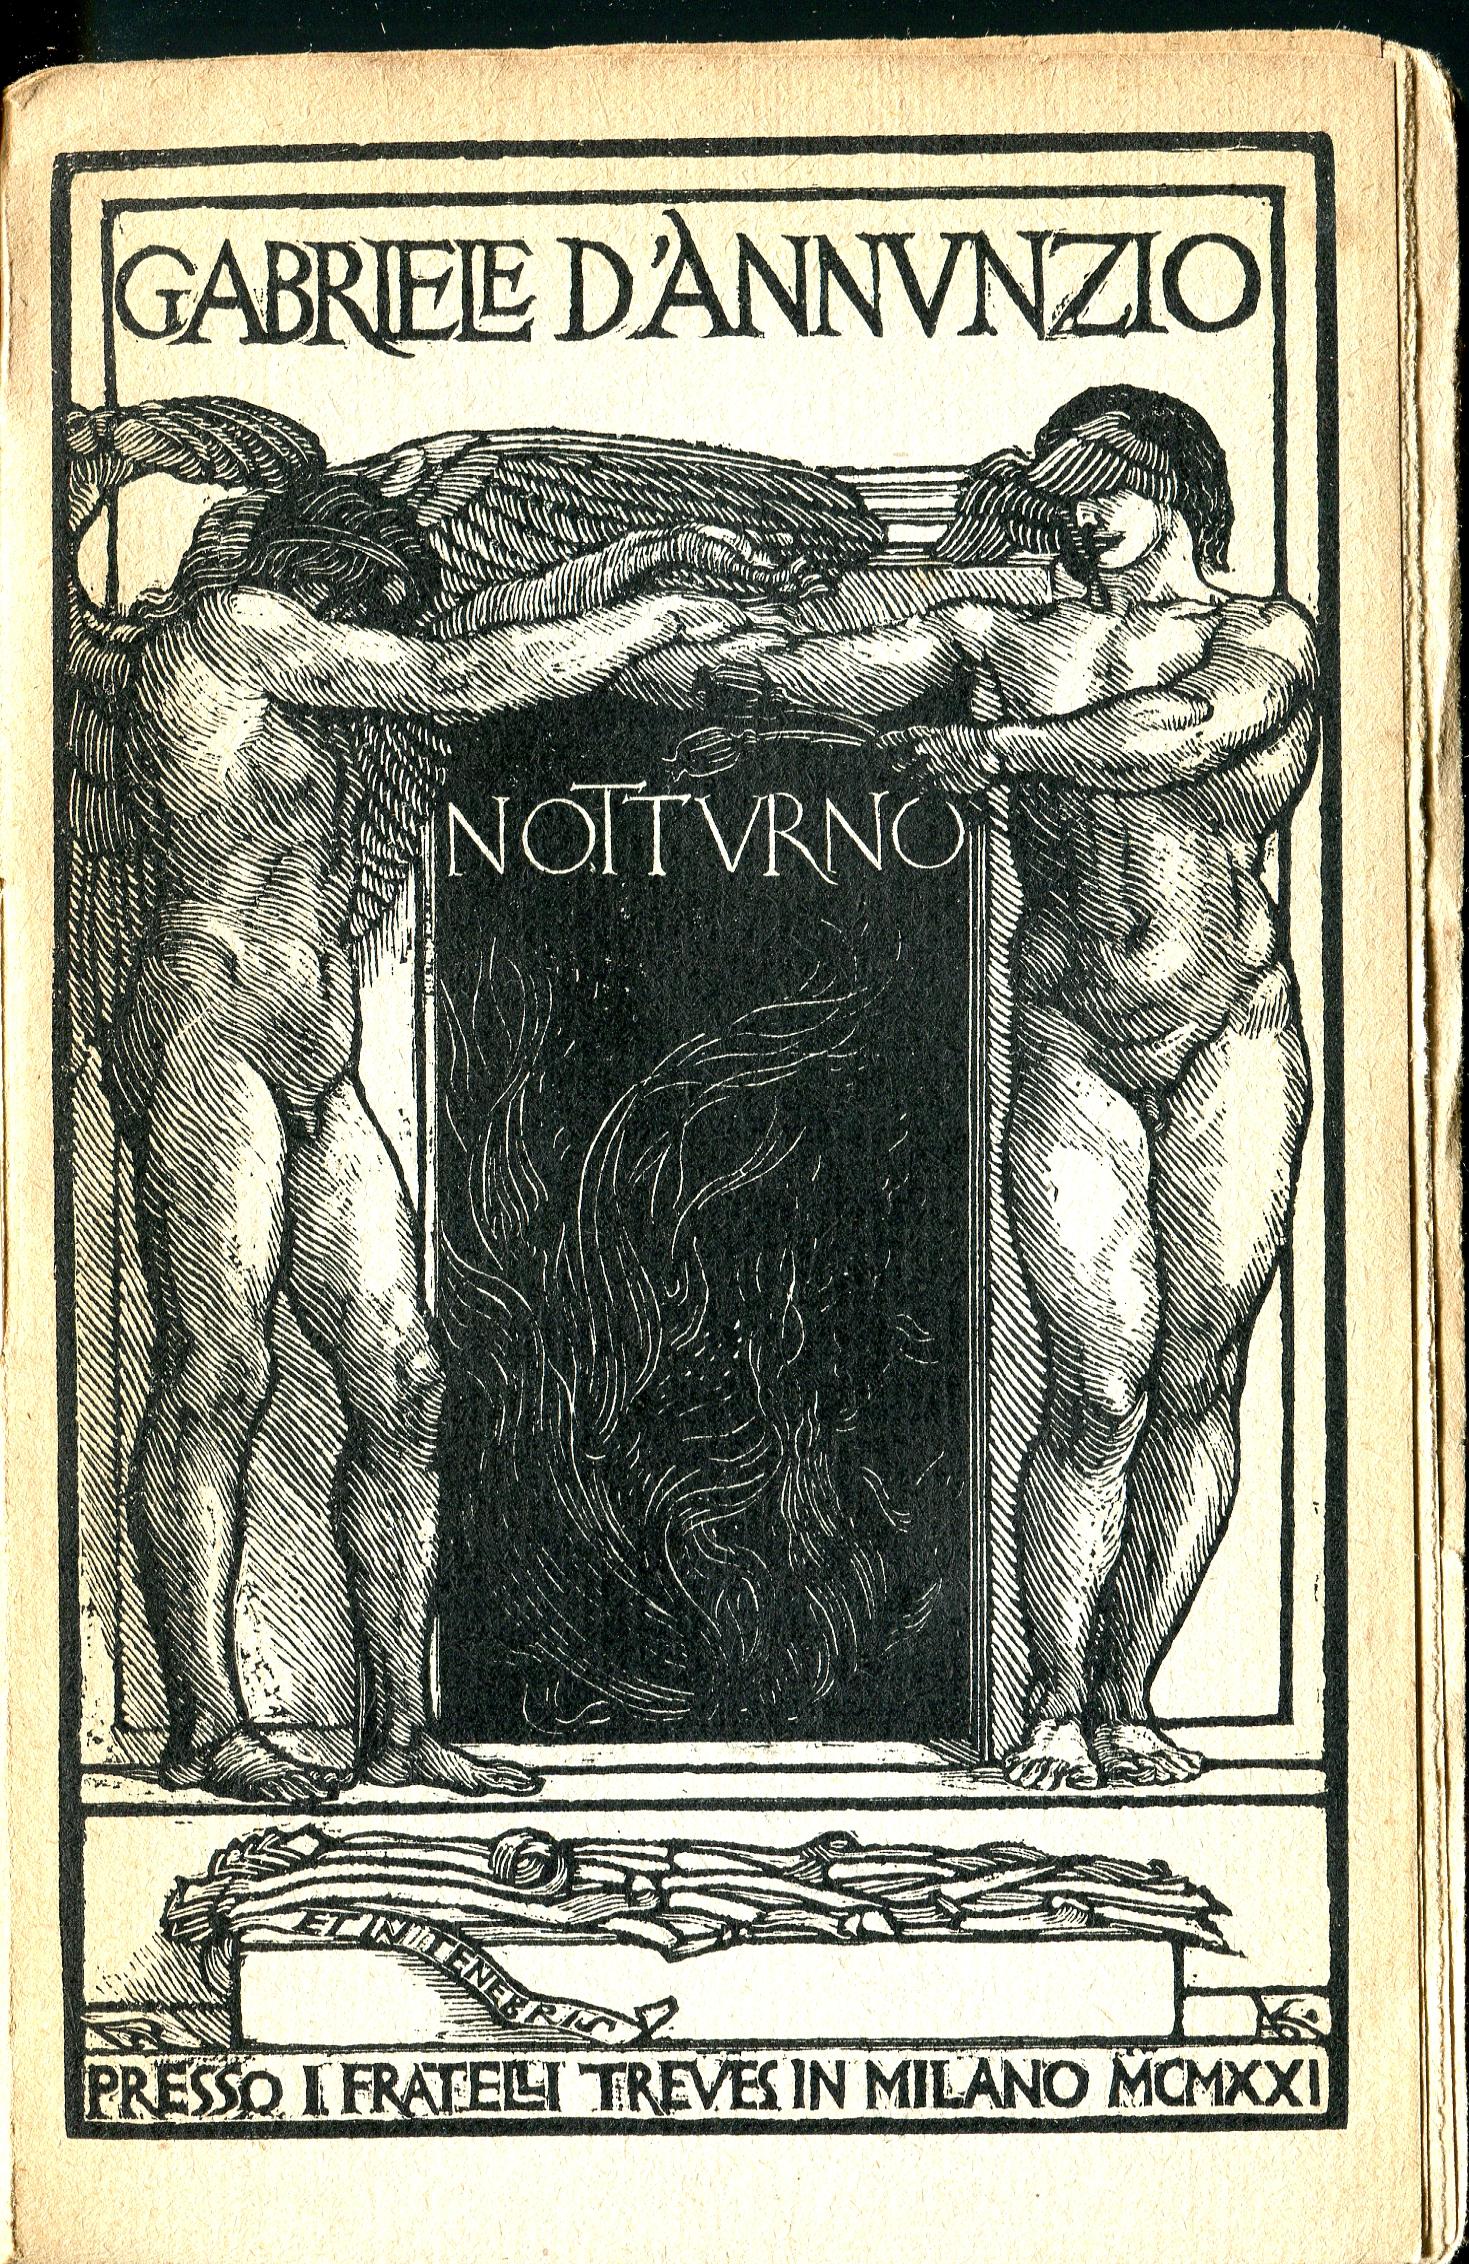 Notturno Gabriele d'Annunzio Squadratlantica